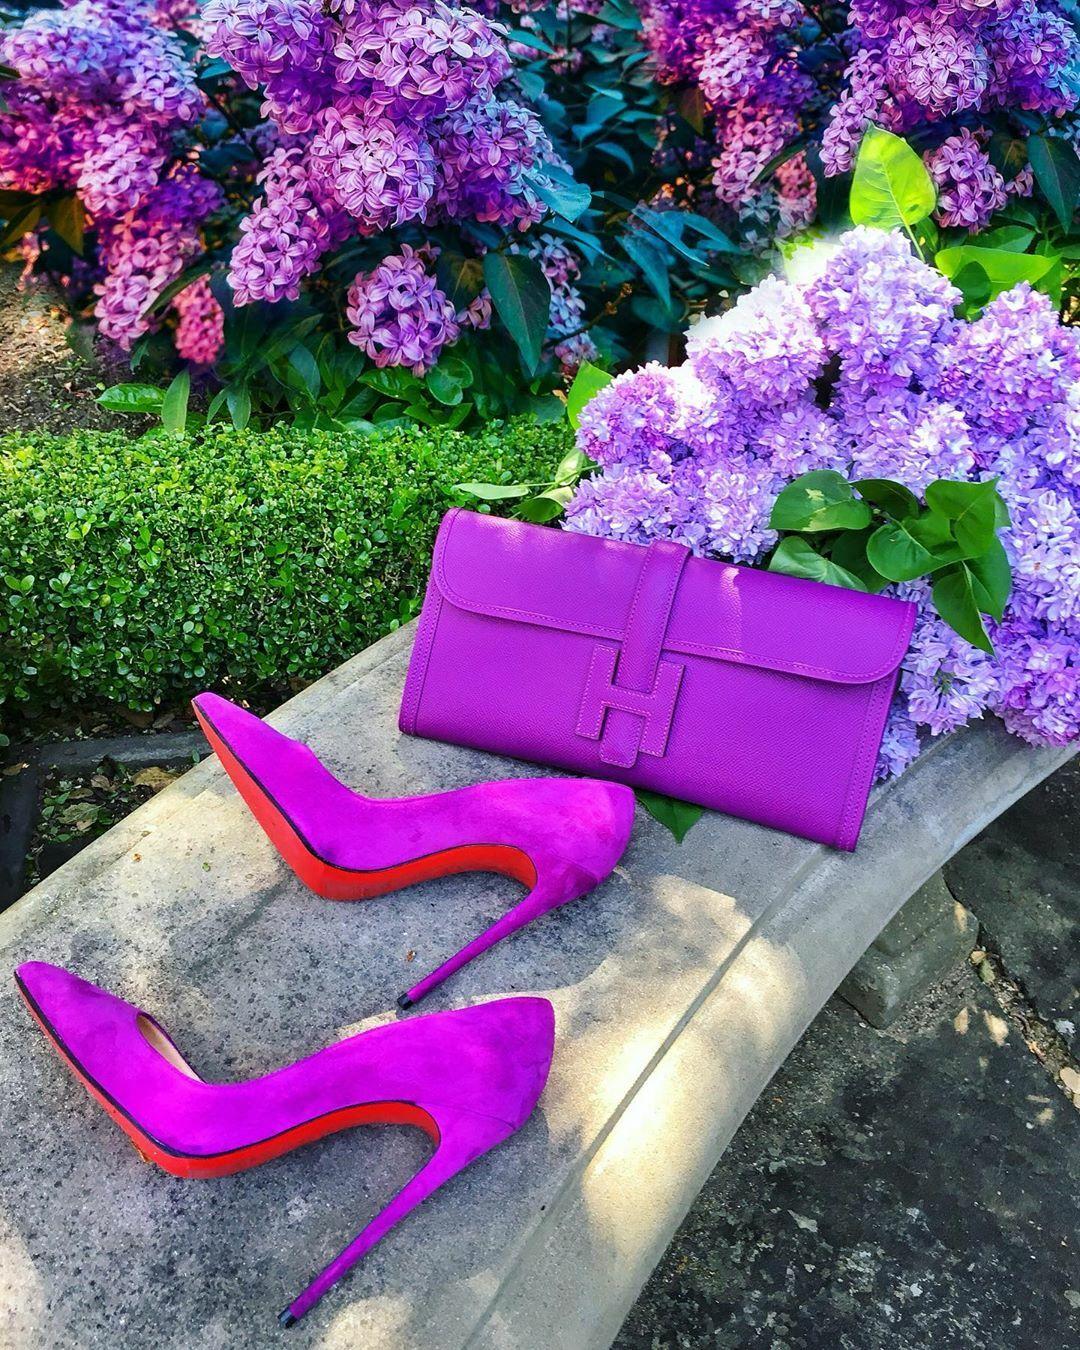 Tủ giày, túi ton sur ton của fashionista giấu mặt - 2